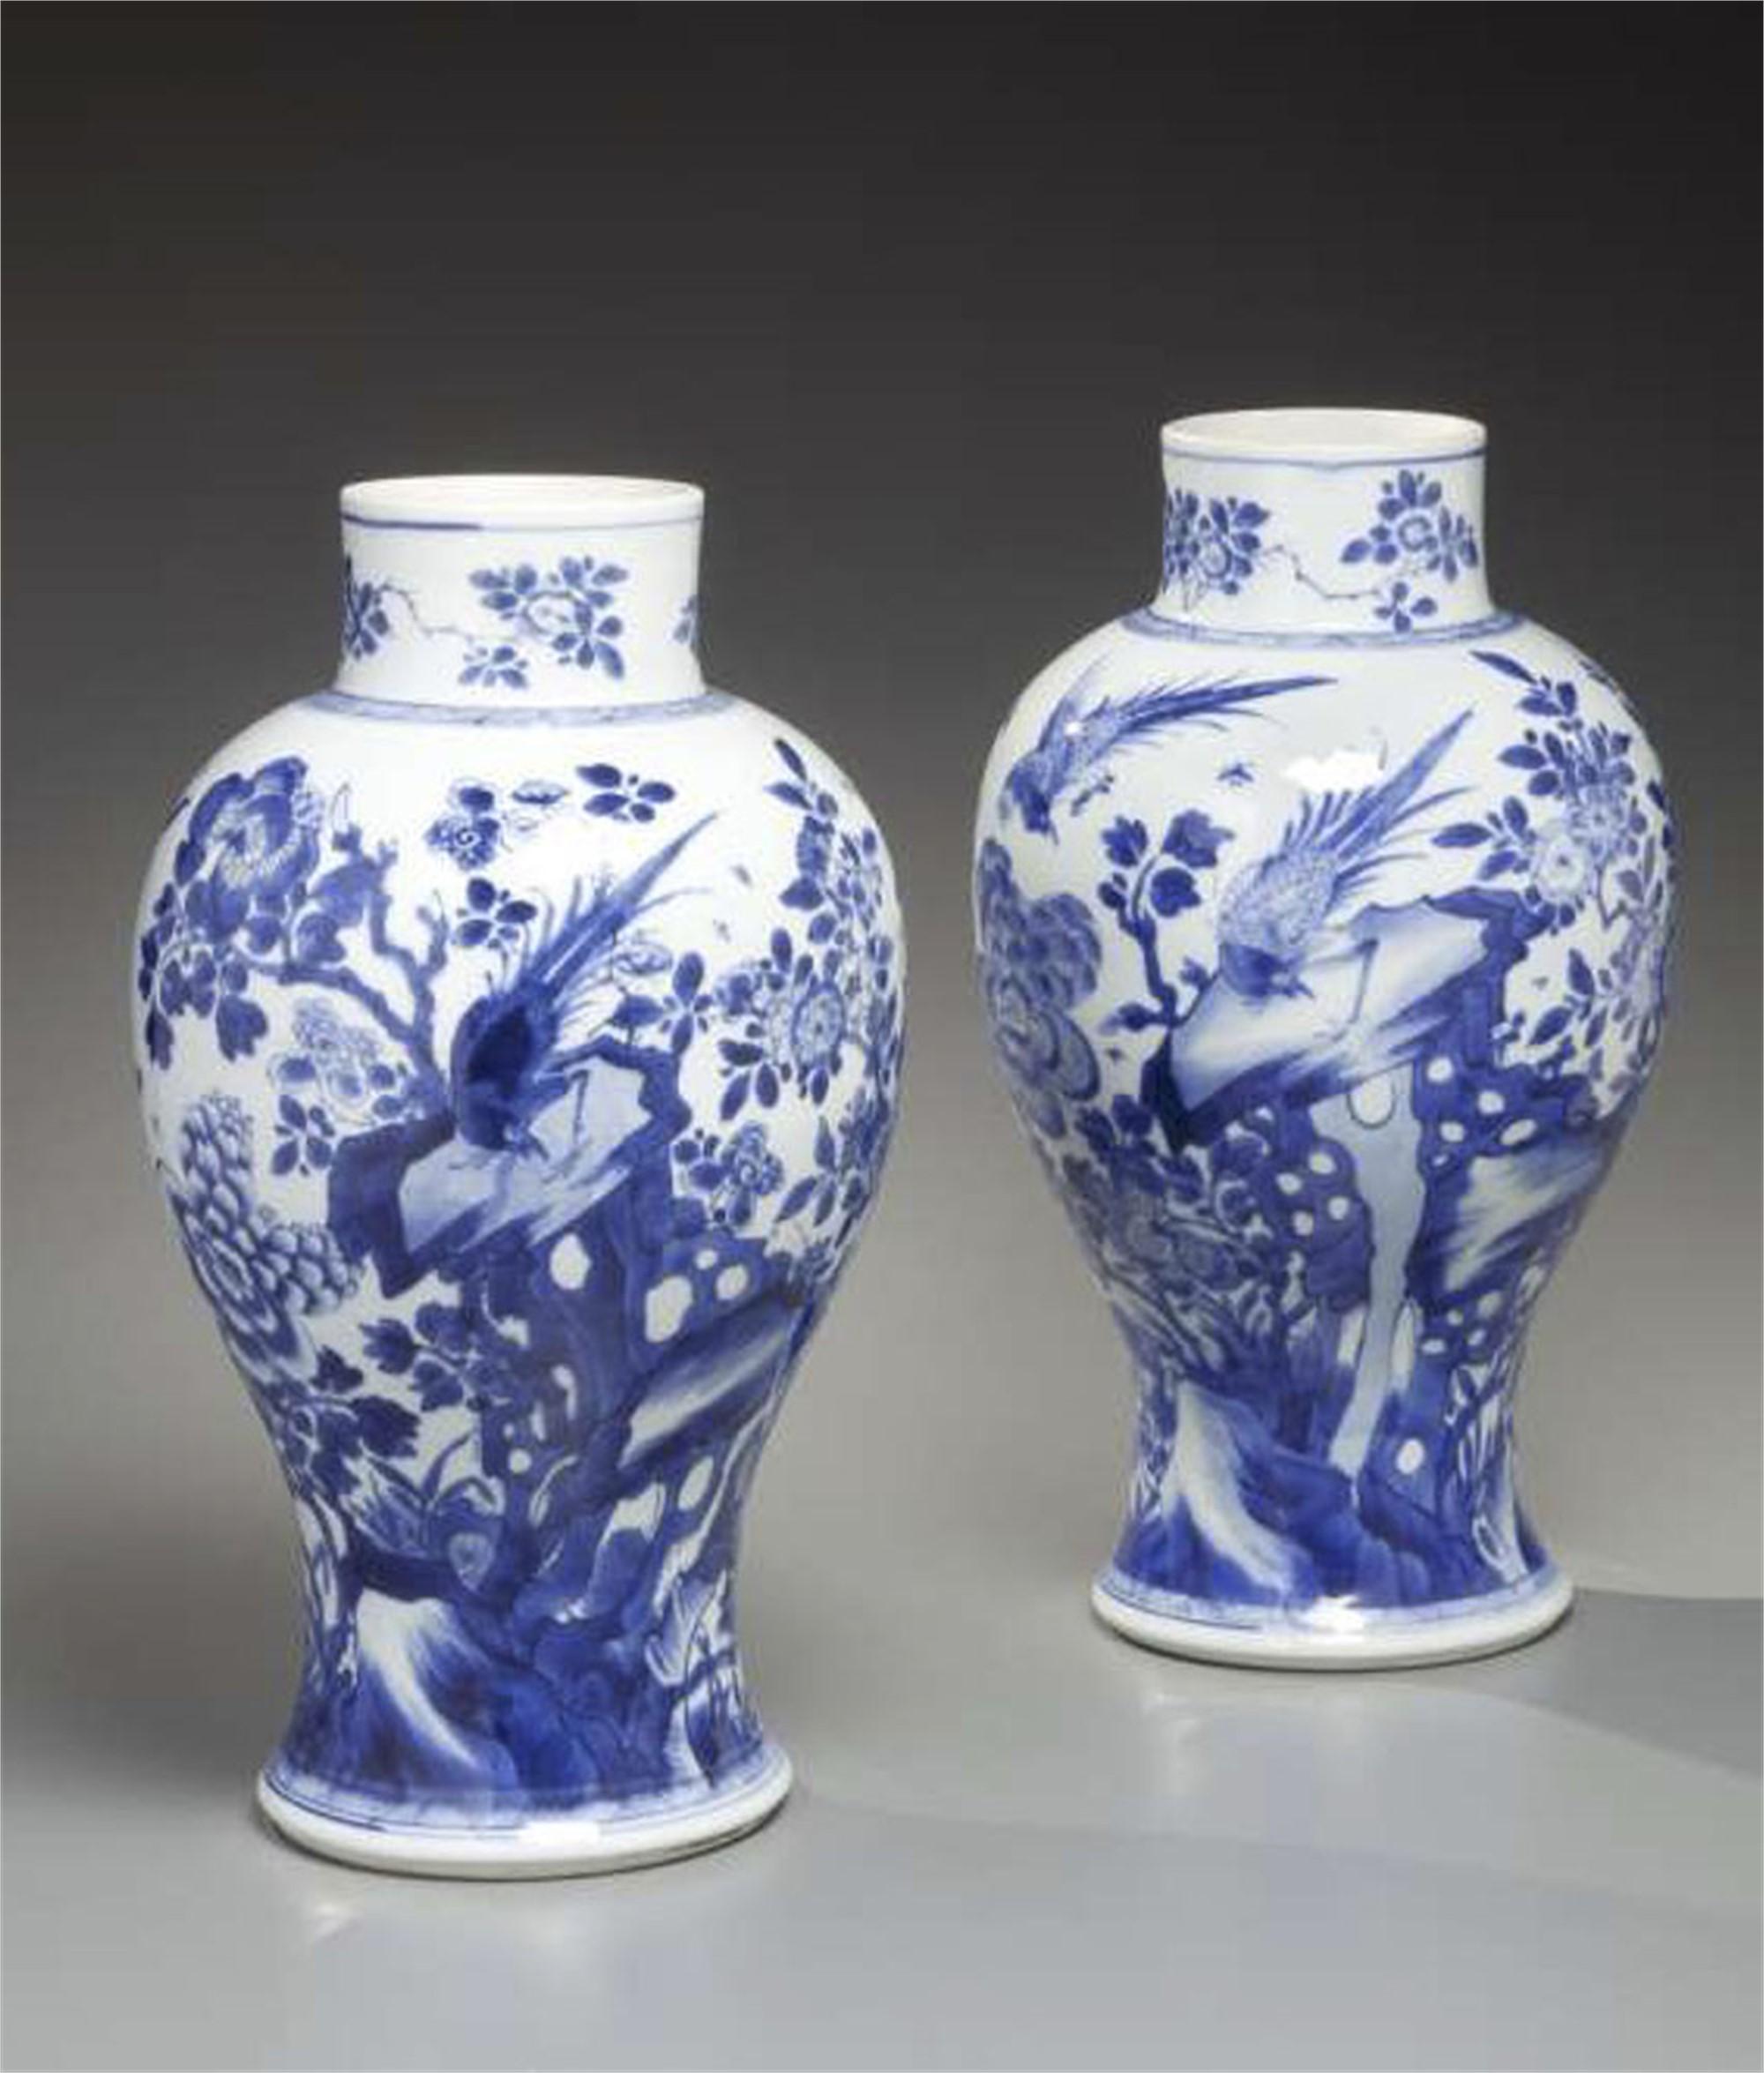 PAIR OF BLUE AND WHITE PORCELAIN BALUSTER FORM VASES